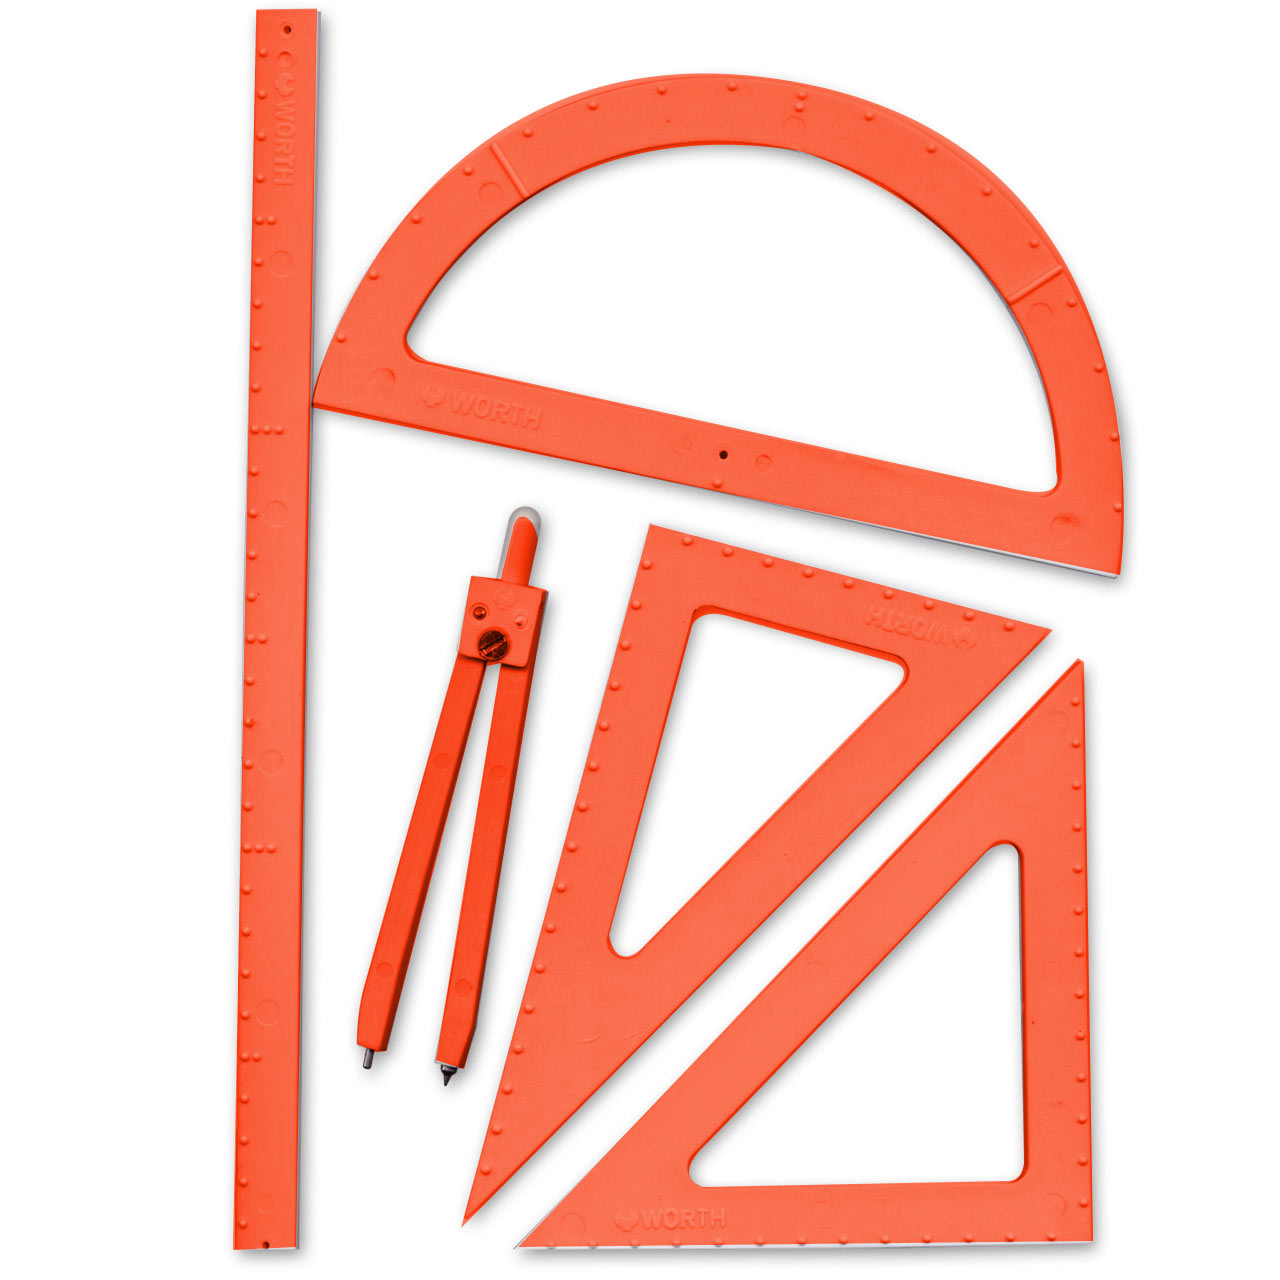 5-Piece Tactile Metric Geometry Set -Large